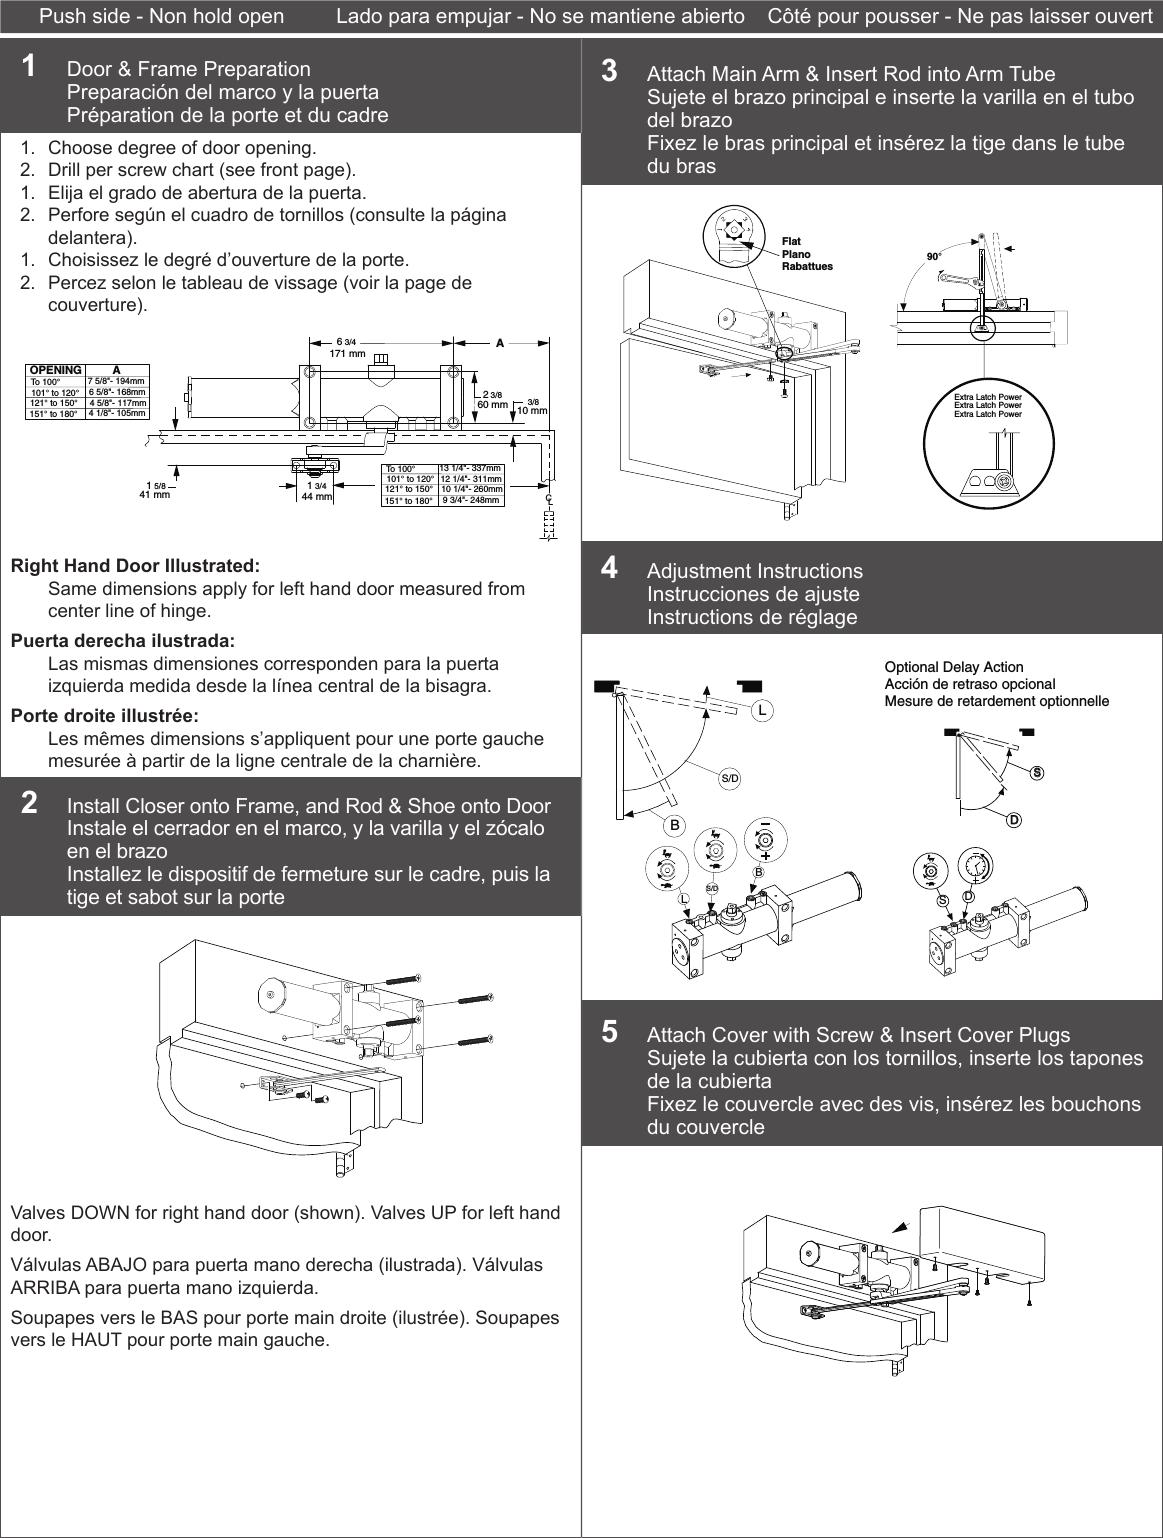 Dexter Falcon Dch1000 Rwpa Instructions Rw Pa 111033